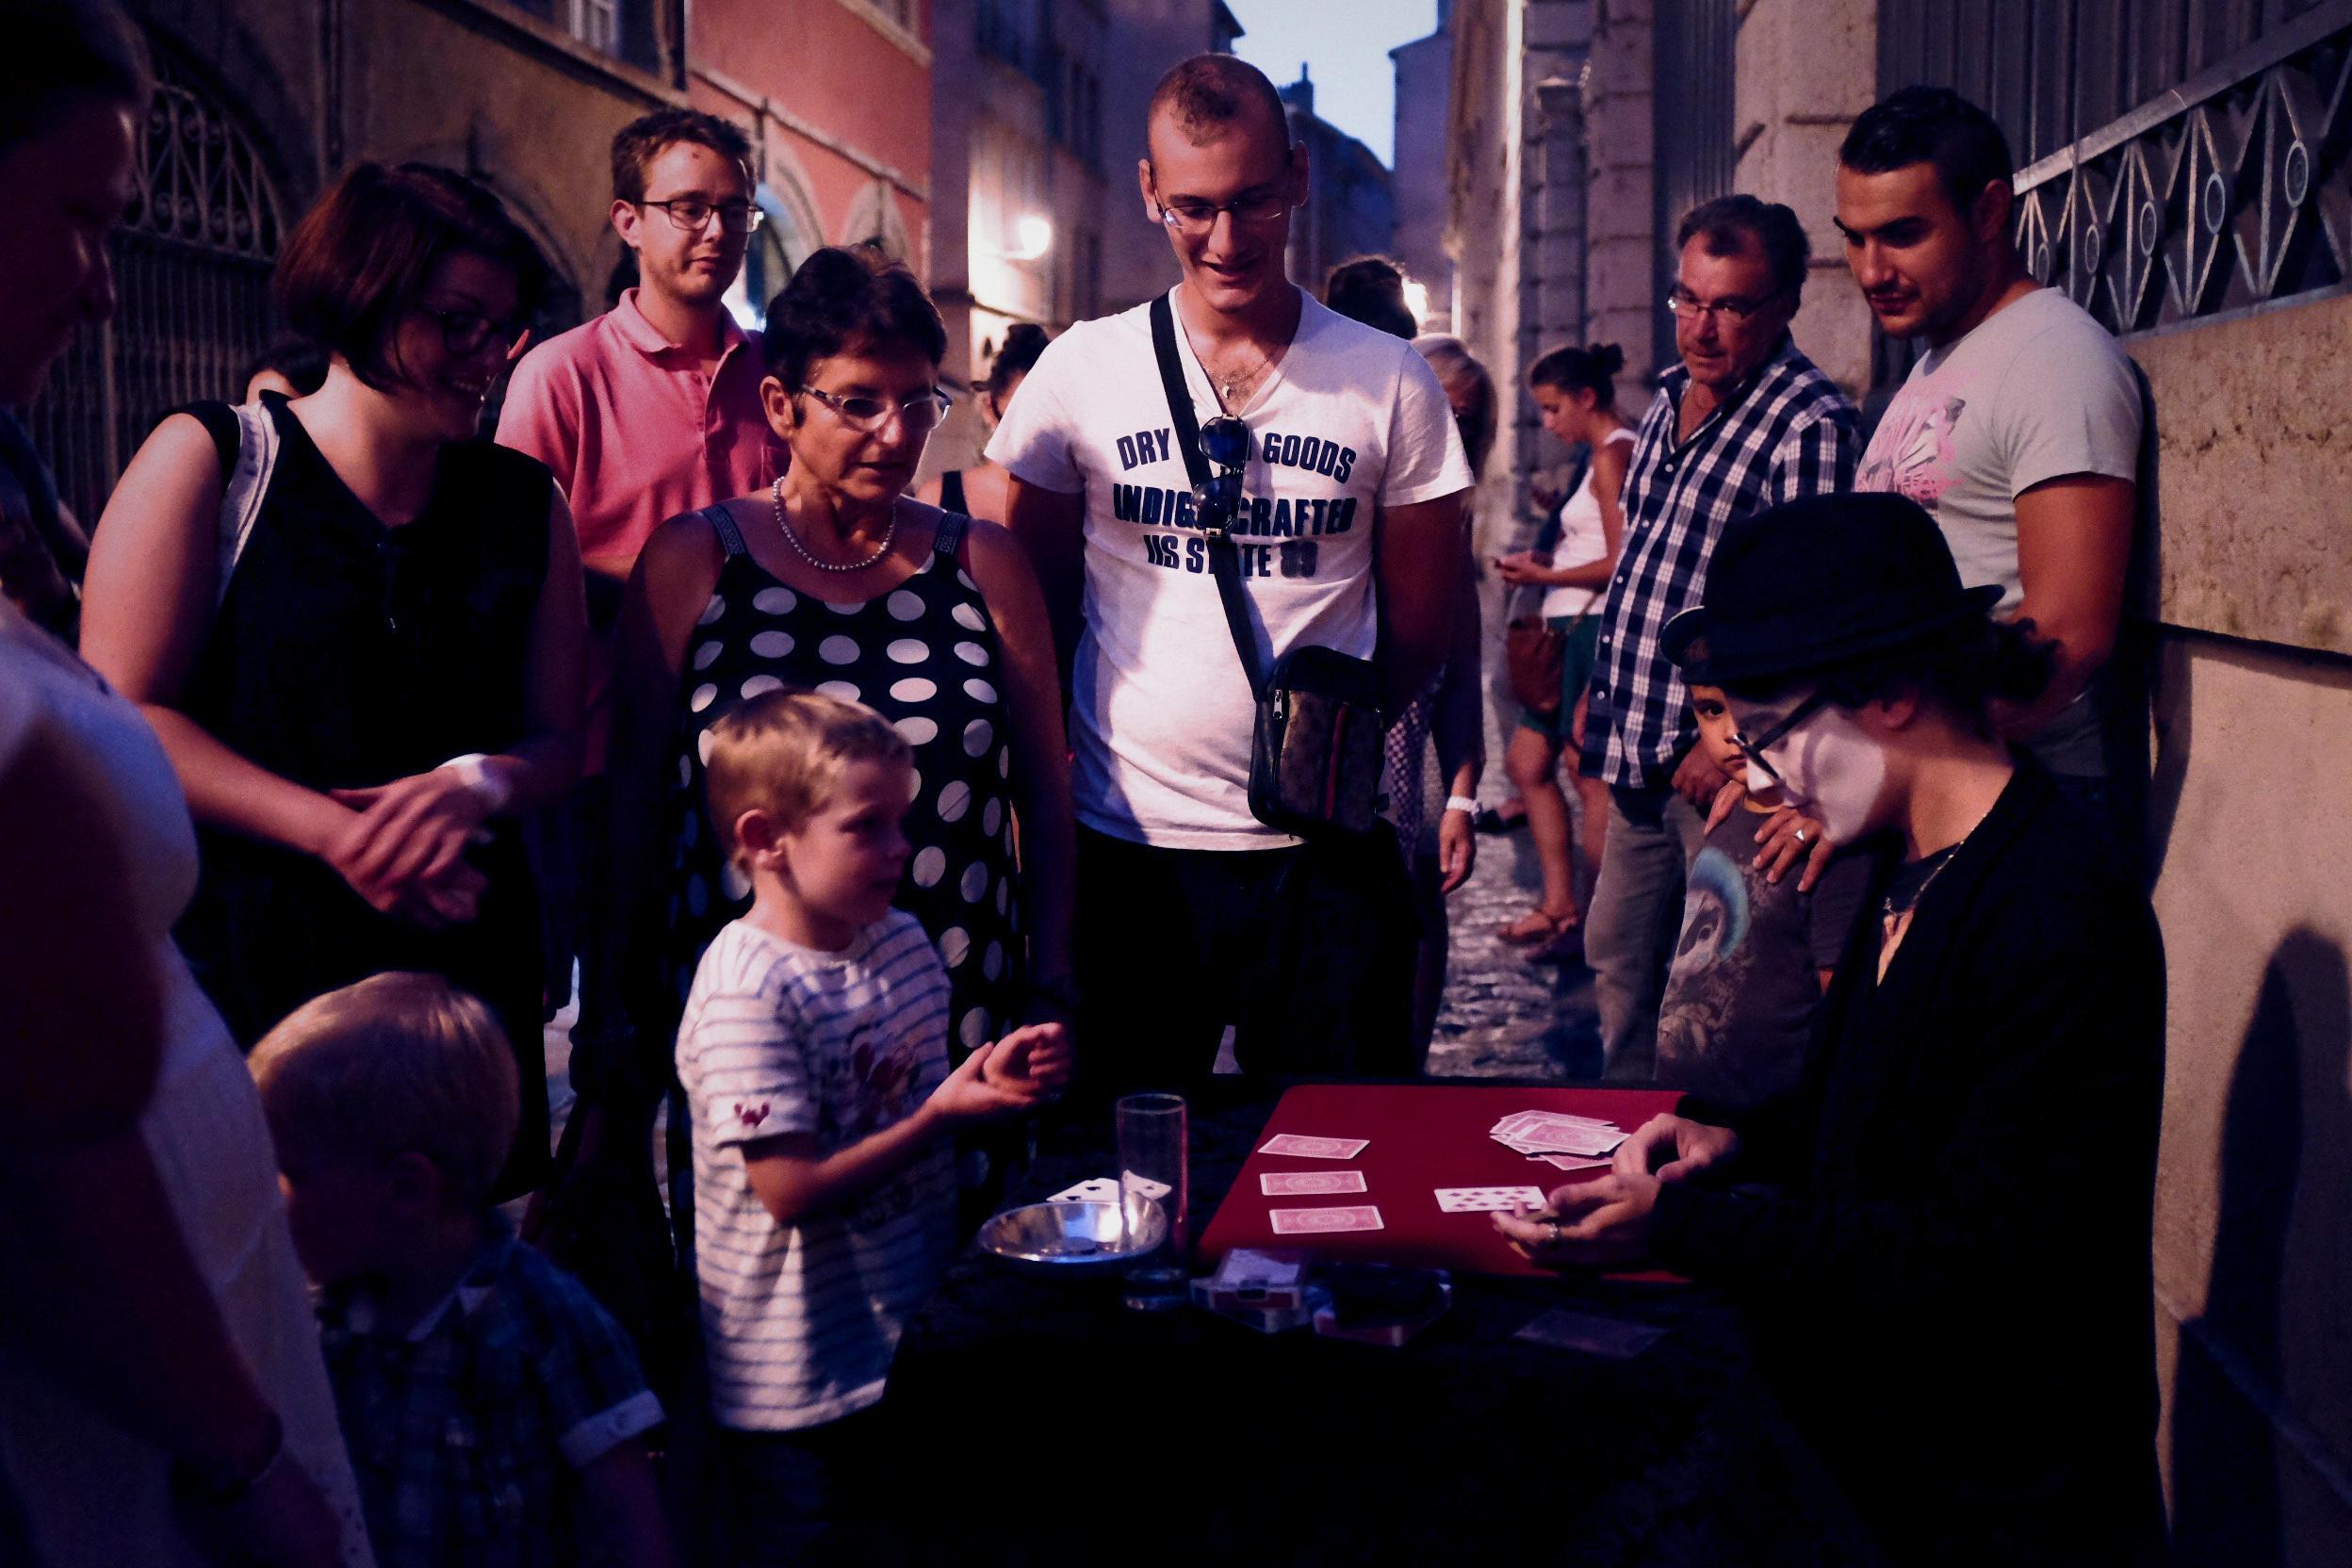 illusionniste Lyon magicien Lyon mariage Close up  animation Lyon Lou illusionniste Lou magicien ill